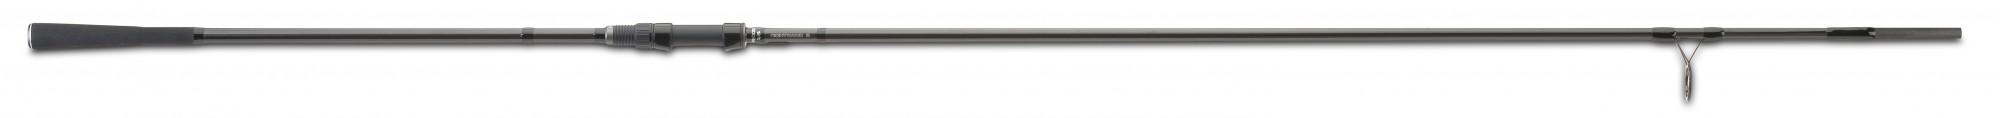 anaconda-nighthawk-2-12ft-3-60m-3-00lb-2t-karpfenrute